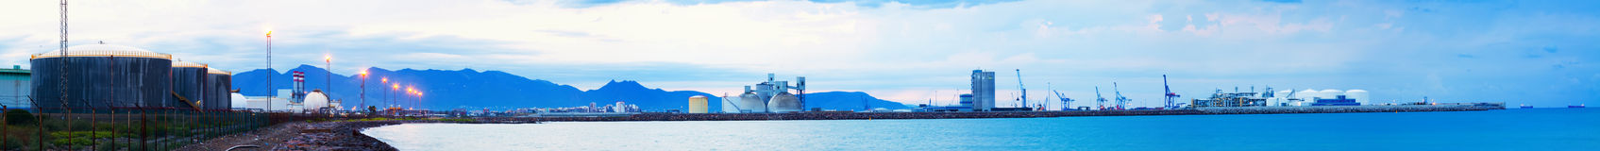 Zona industrial na costa mediterrânea Fotografia de Stock